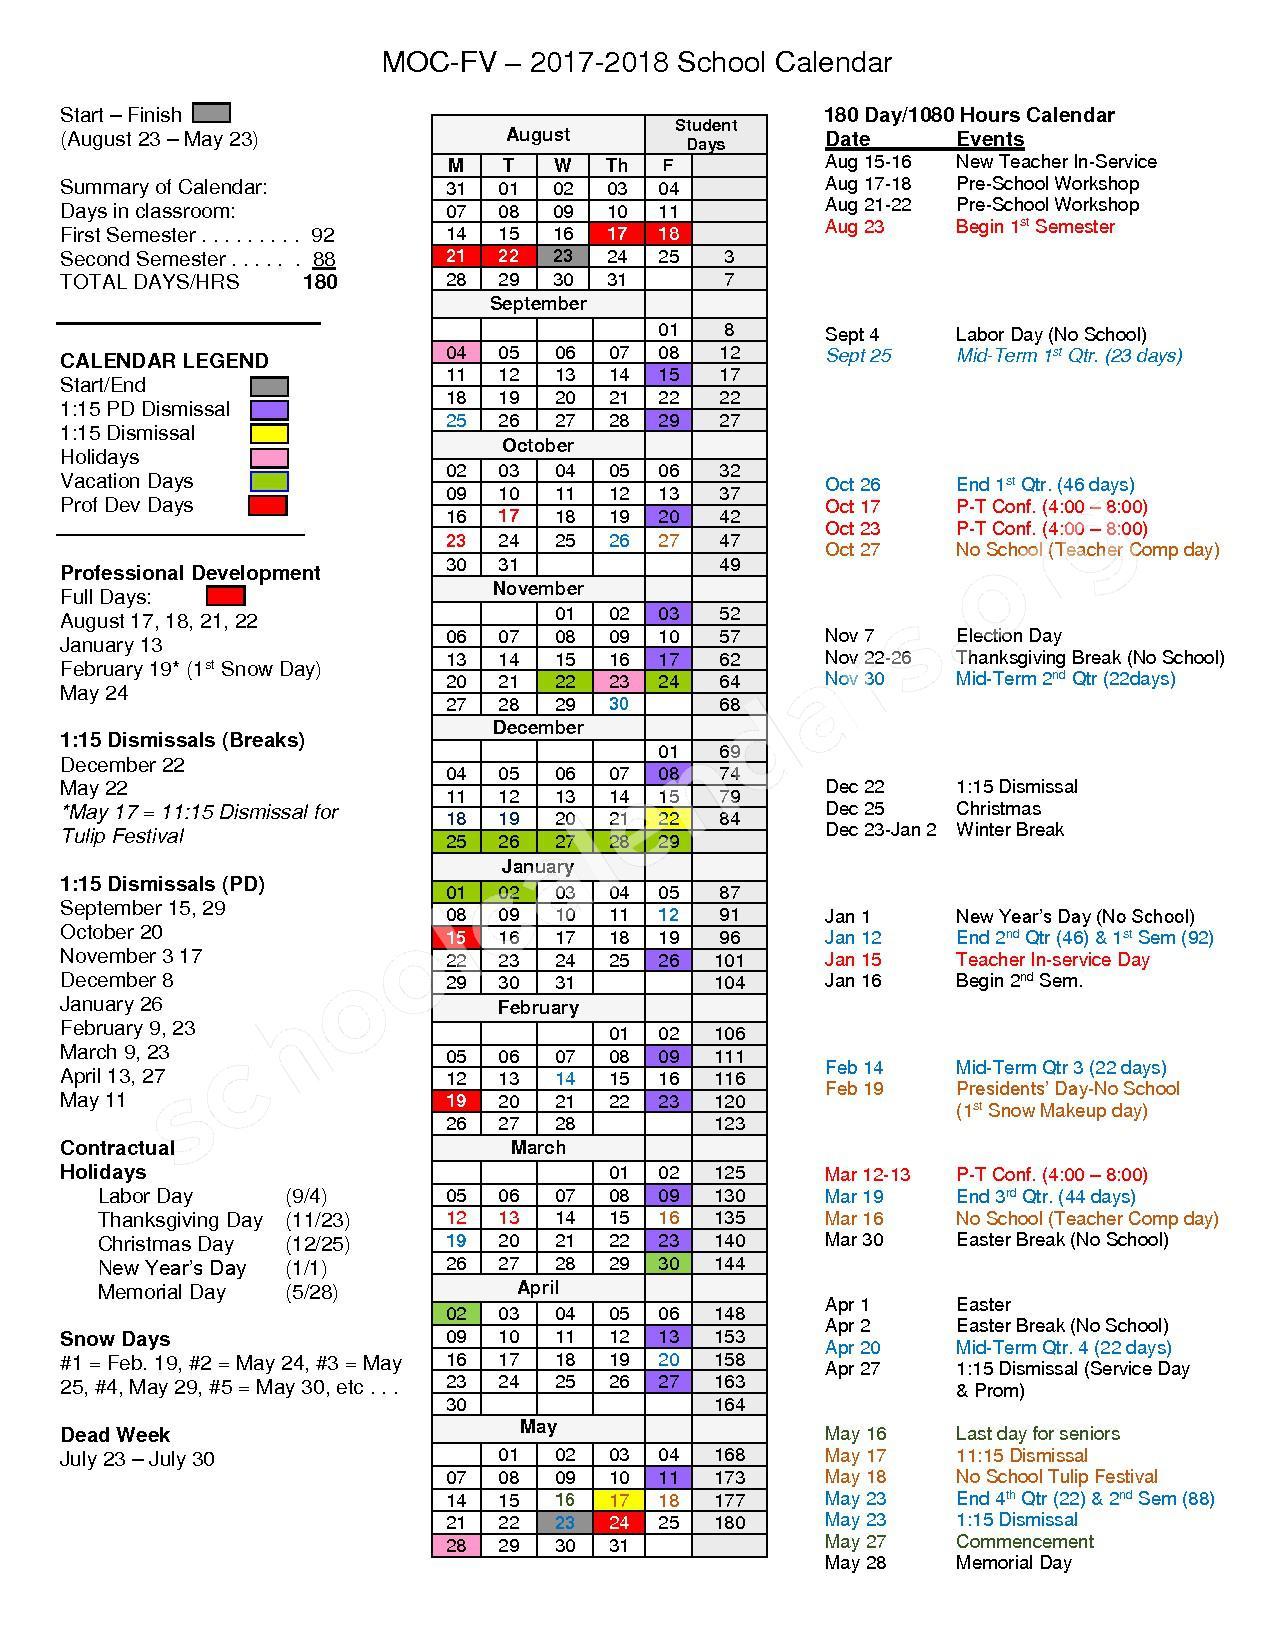 2017 - 2018 School Calendar – Moc-Floyd Valley Community School District – page 1